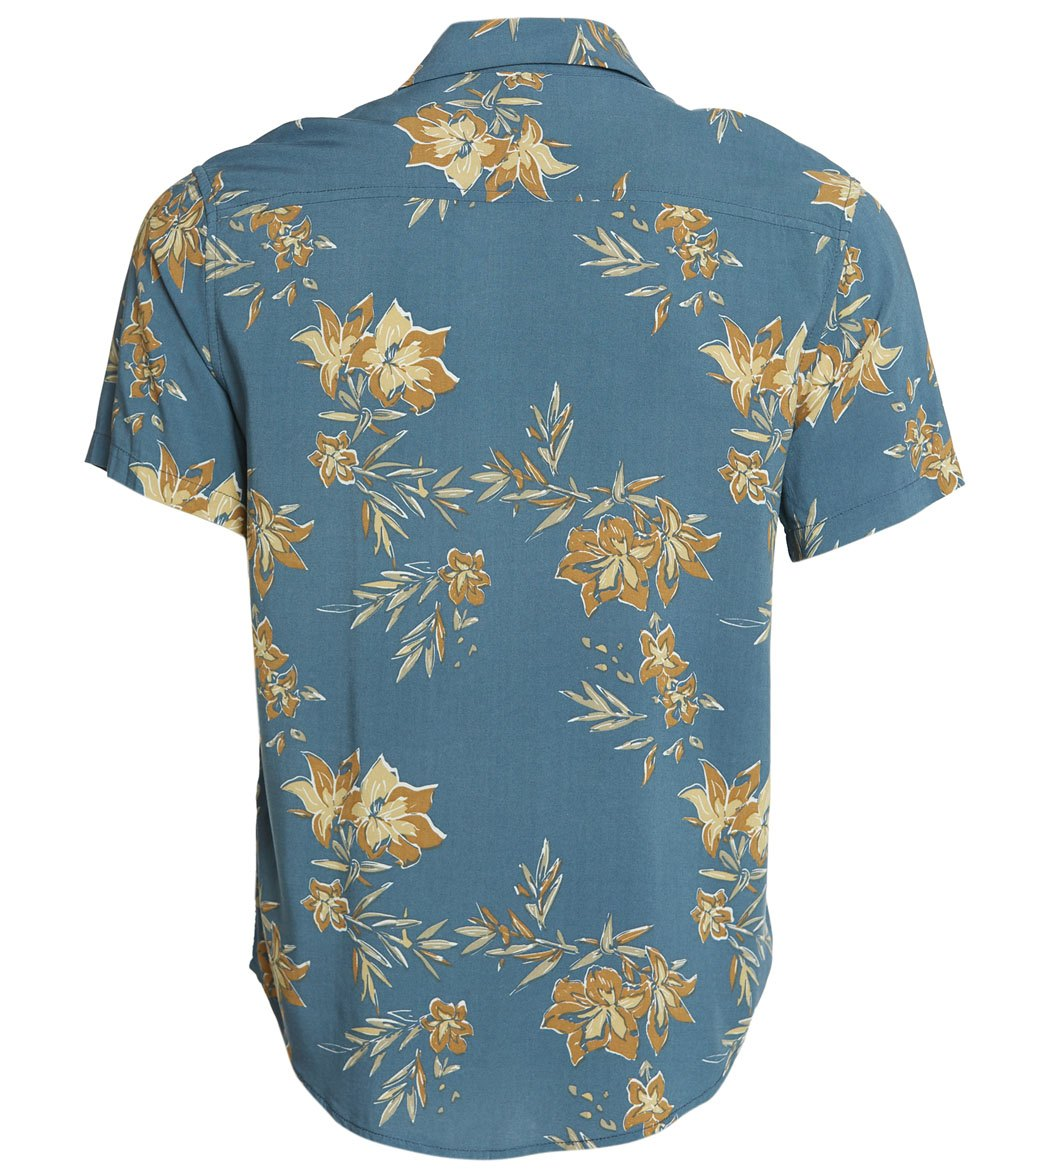 cf384eef873cf2 Rhythm Vintage Aloha Short Sleeve Shirt at SwimOutlet.com - Free ...